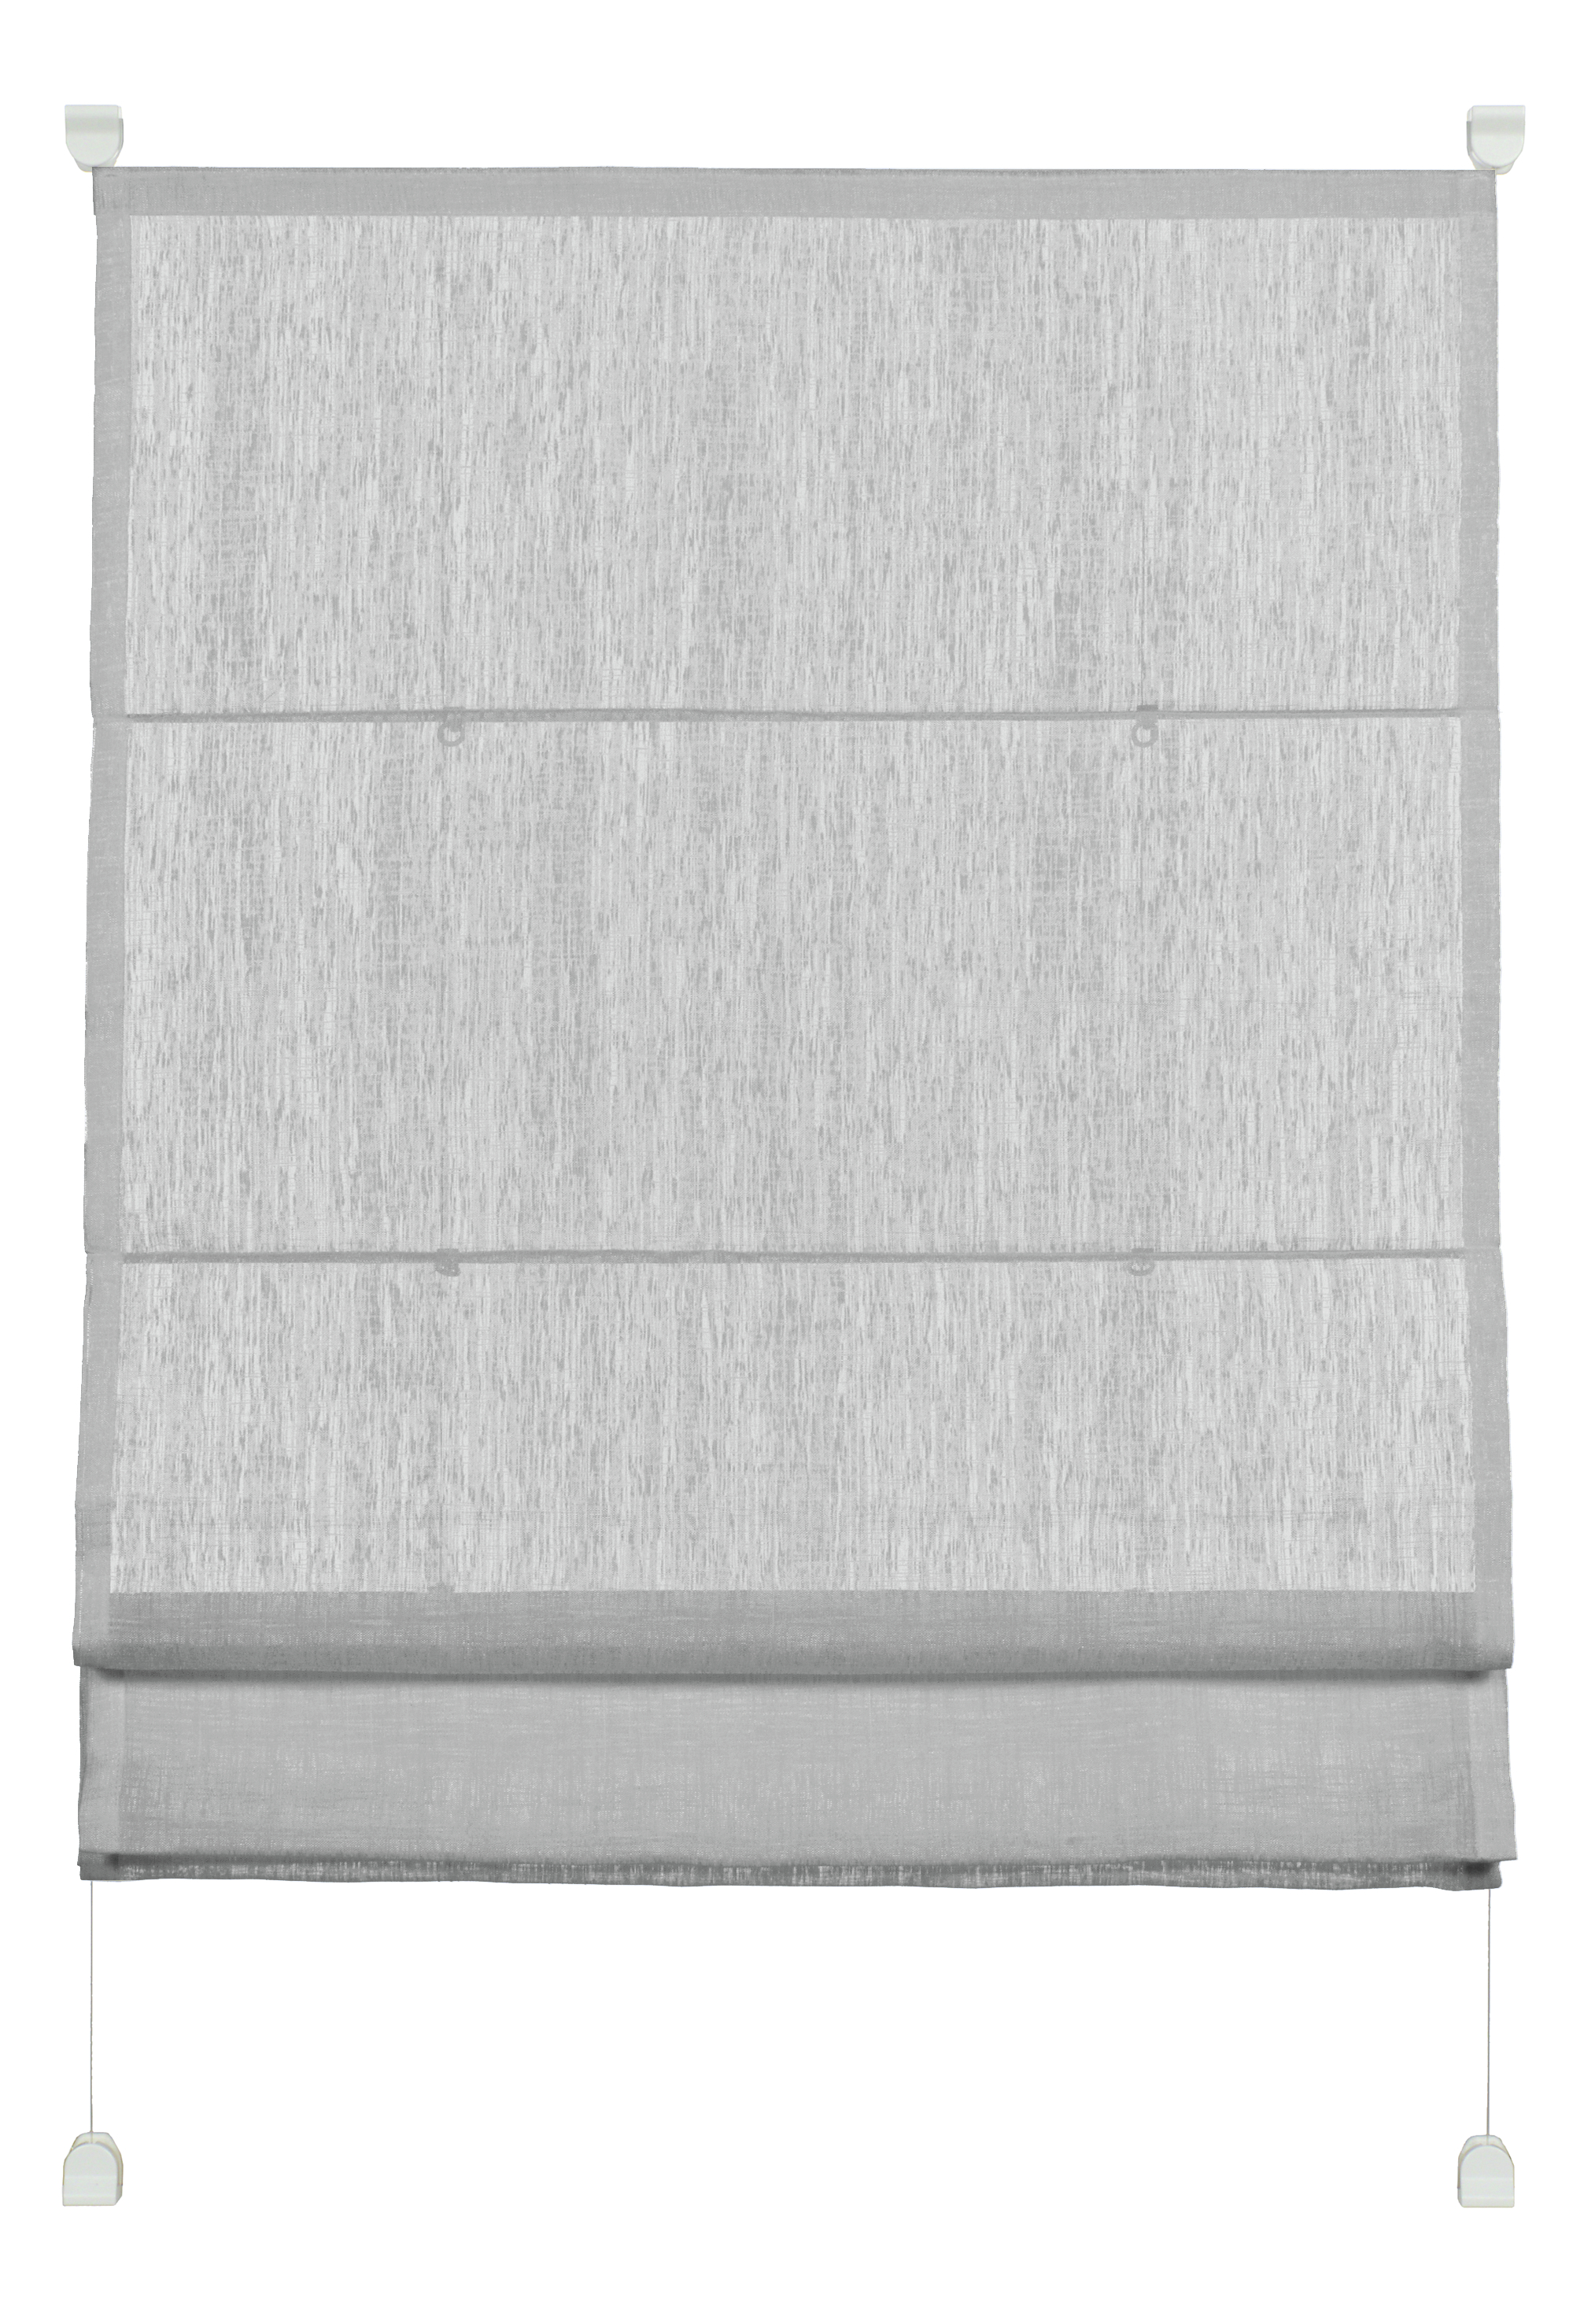 easyfix raffrollo struktur grau 80 x 140 cm 32414. Black Bedroom Furniture Sets. Home Design Ideas